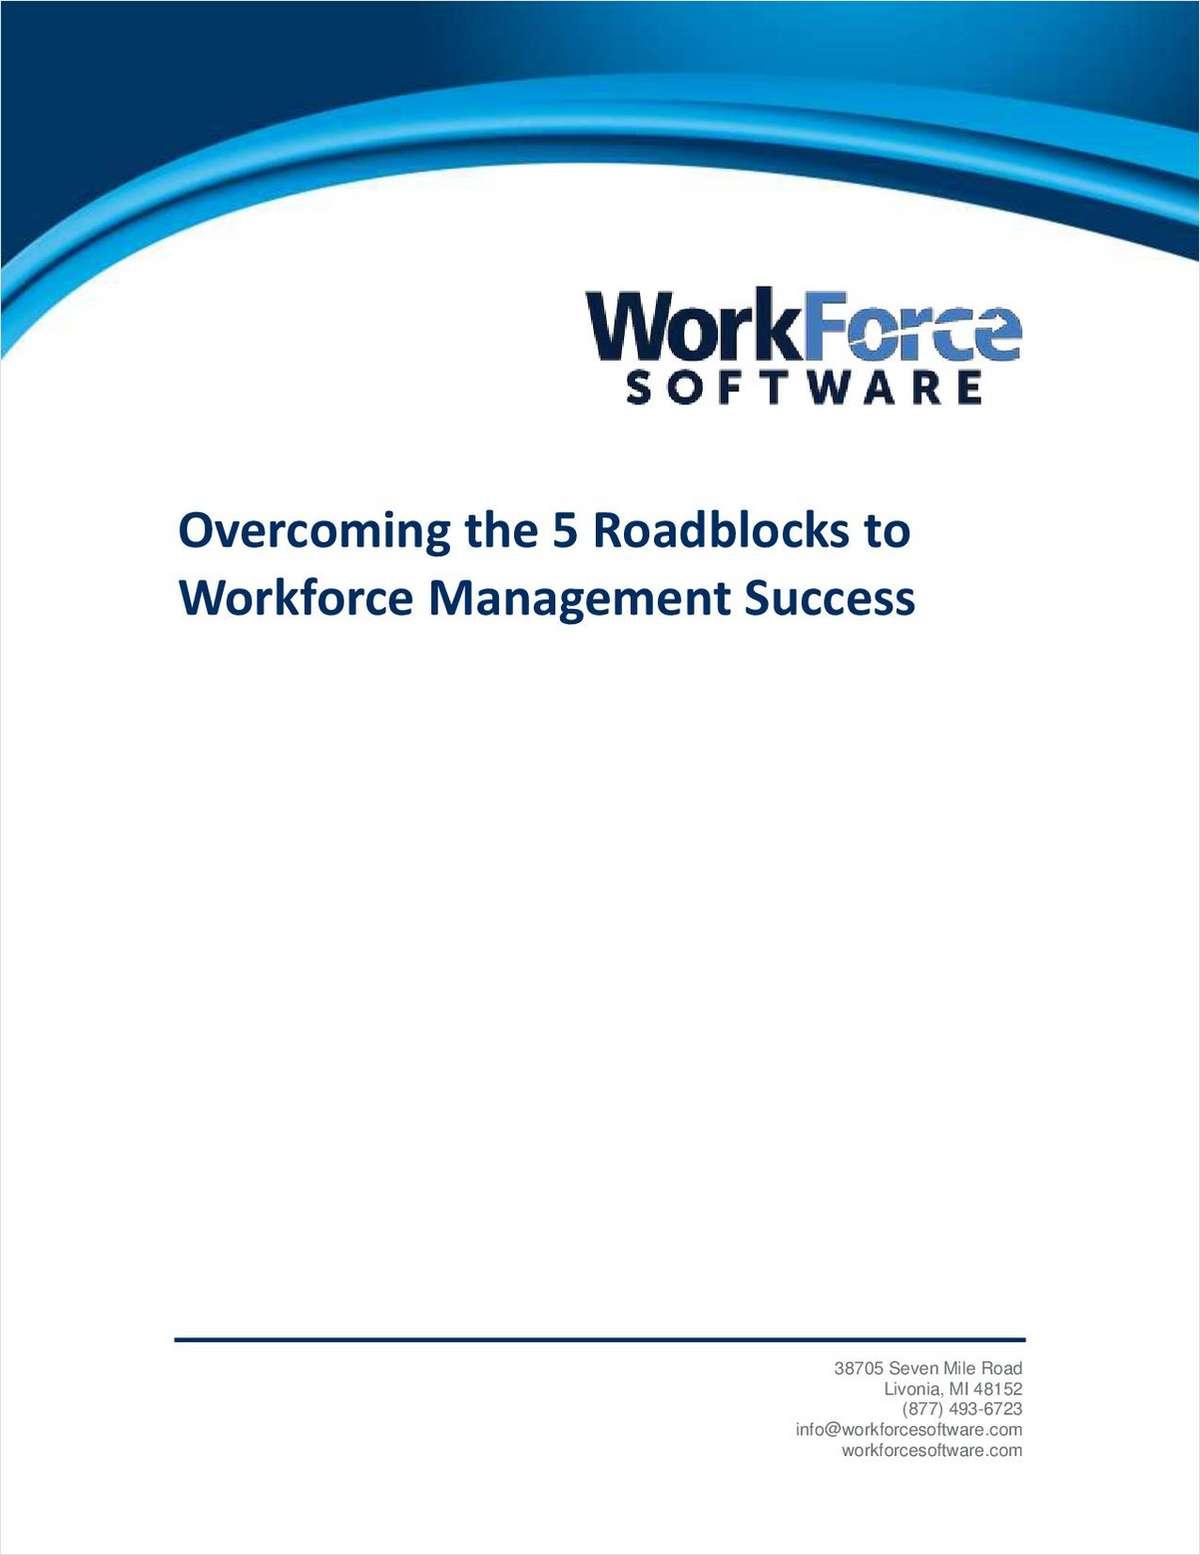 Overcoming the 5 Roadblocks to Workforce Management Success